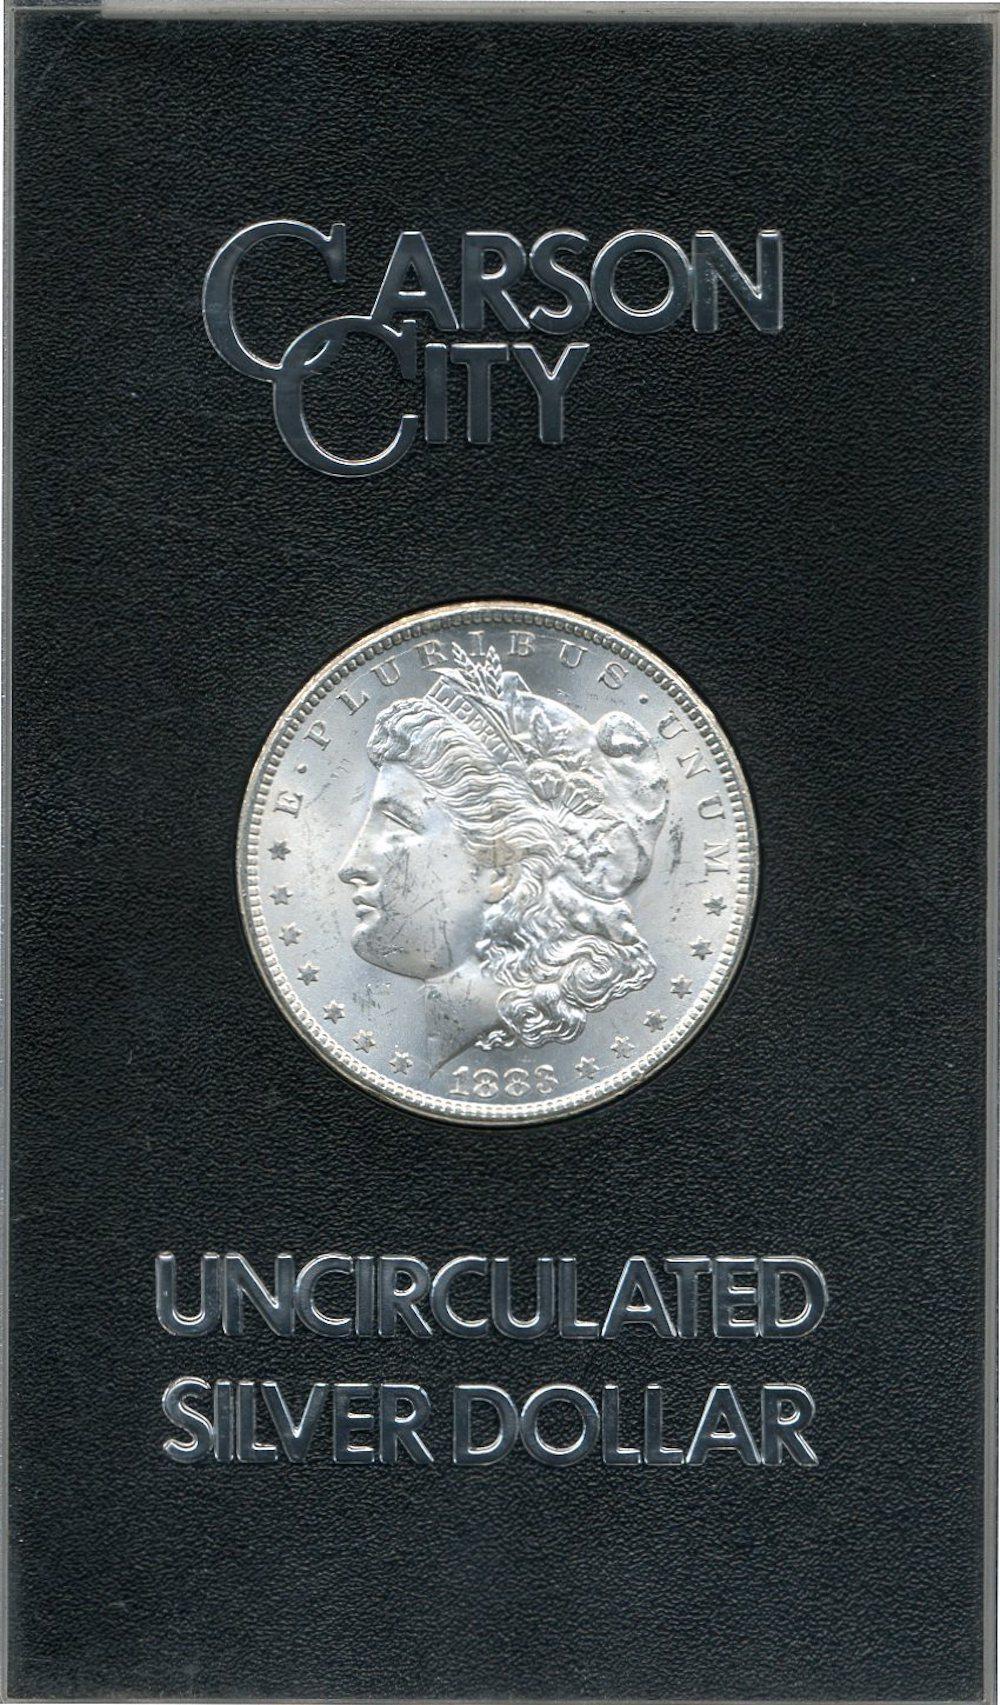 Original 1883-CC GSA Morgan Silver Dollar